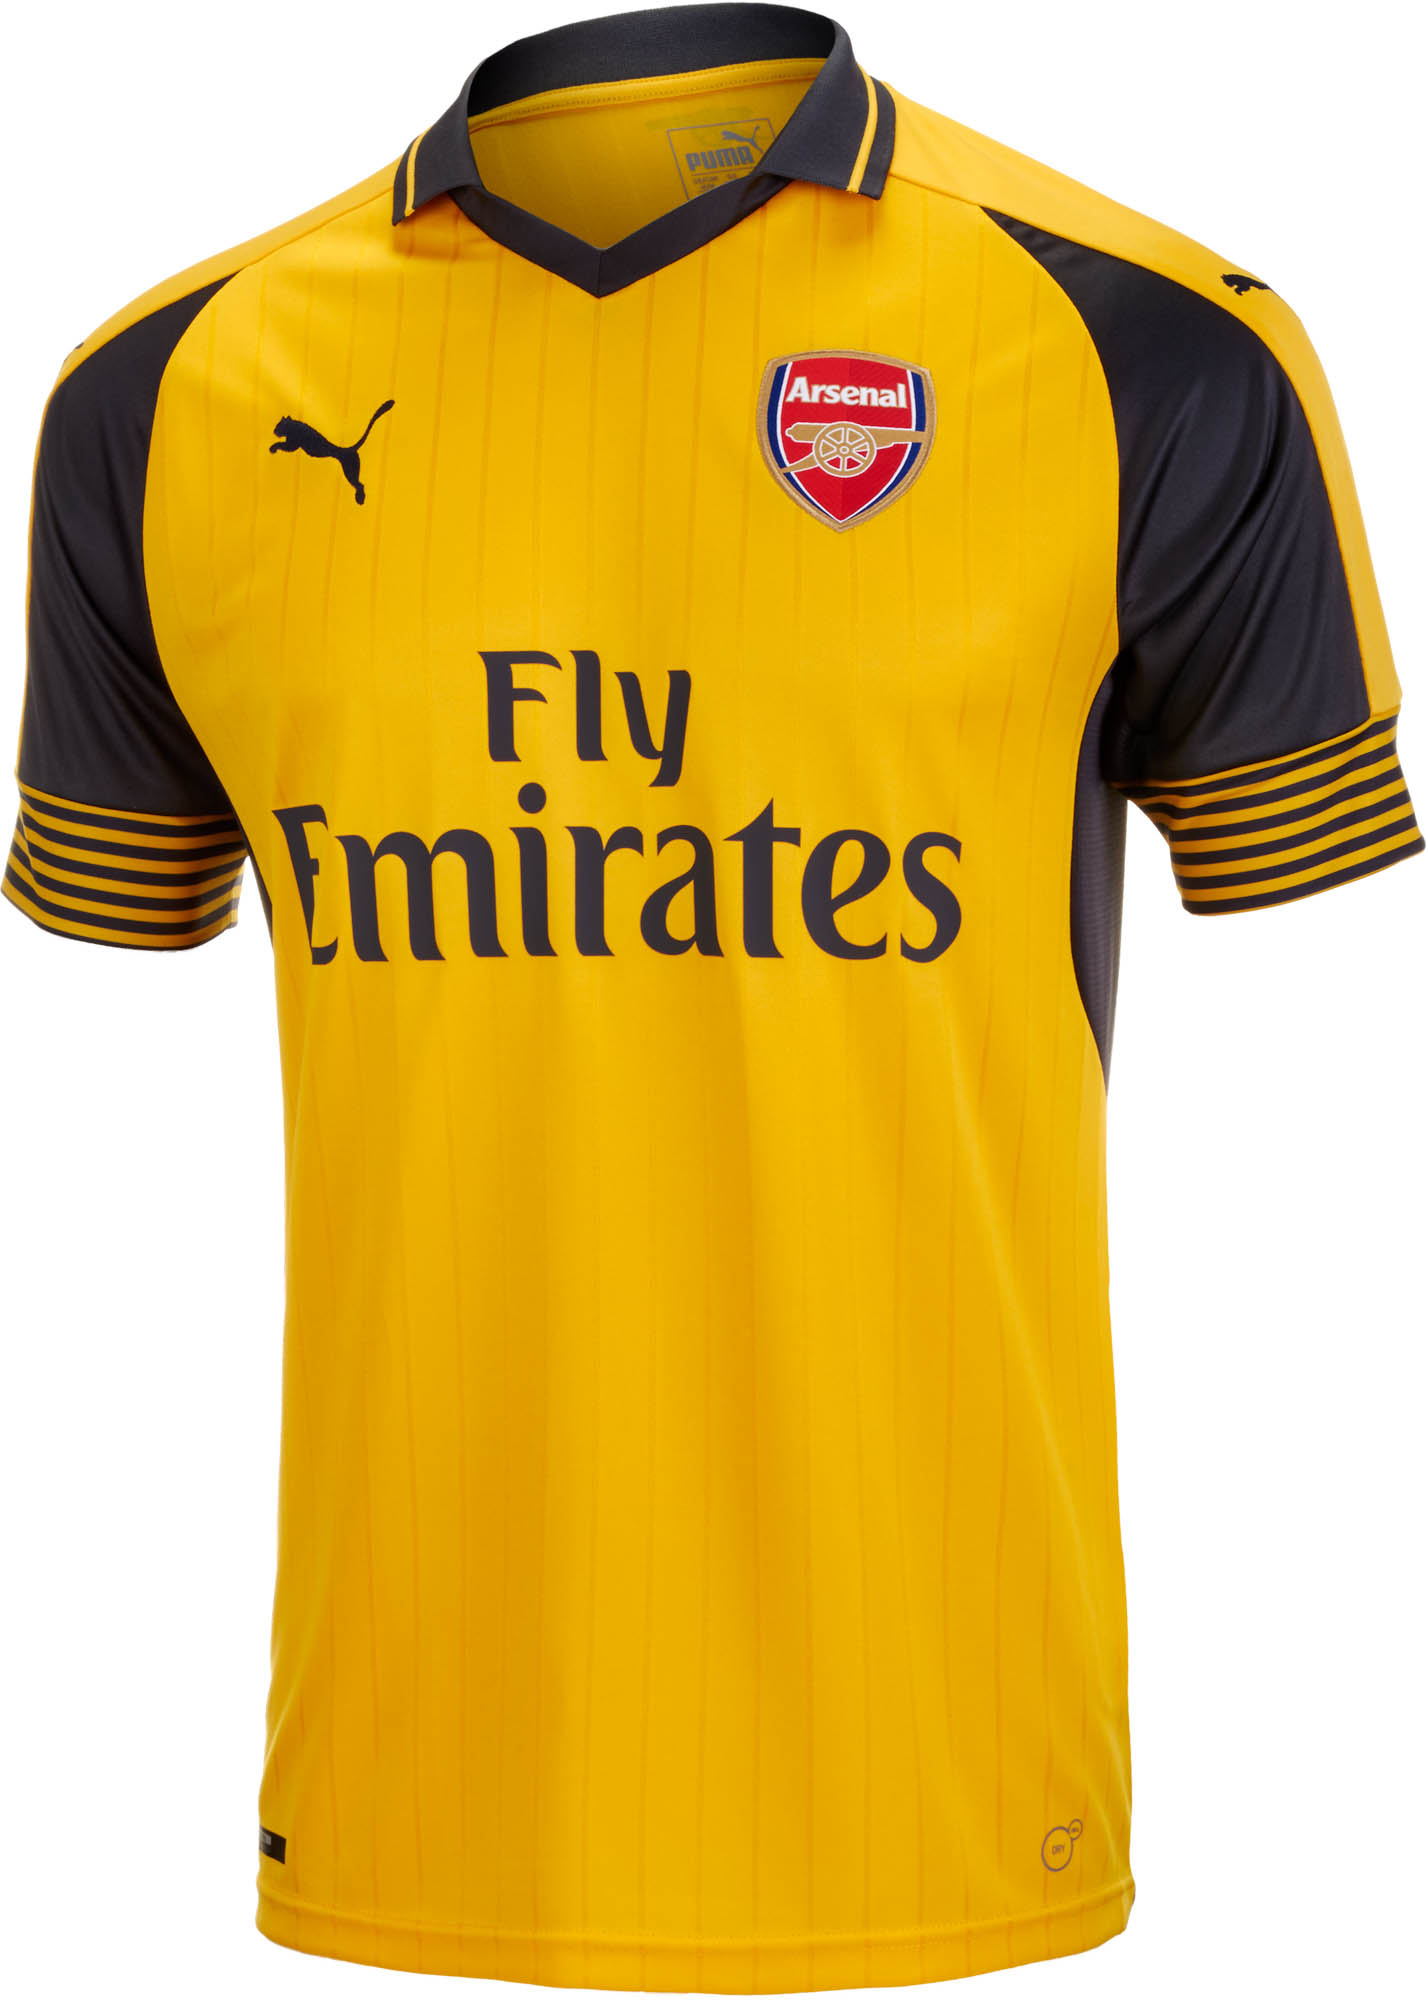 a1e506247 arsenal away uniform on sale   OFF39% Discounts